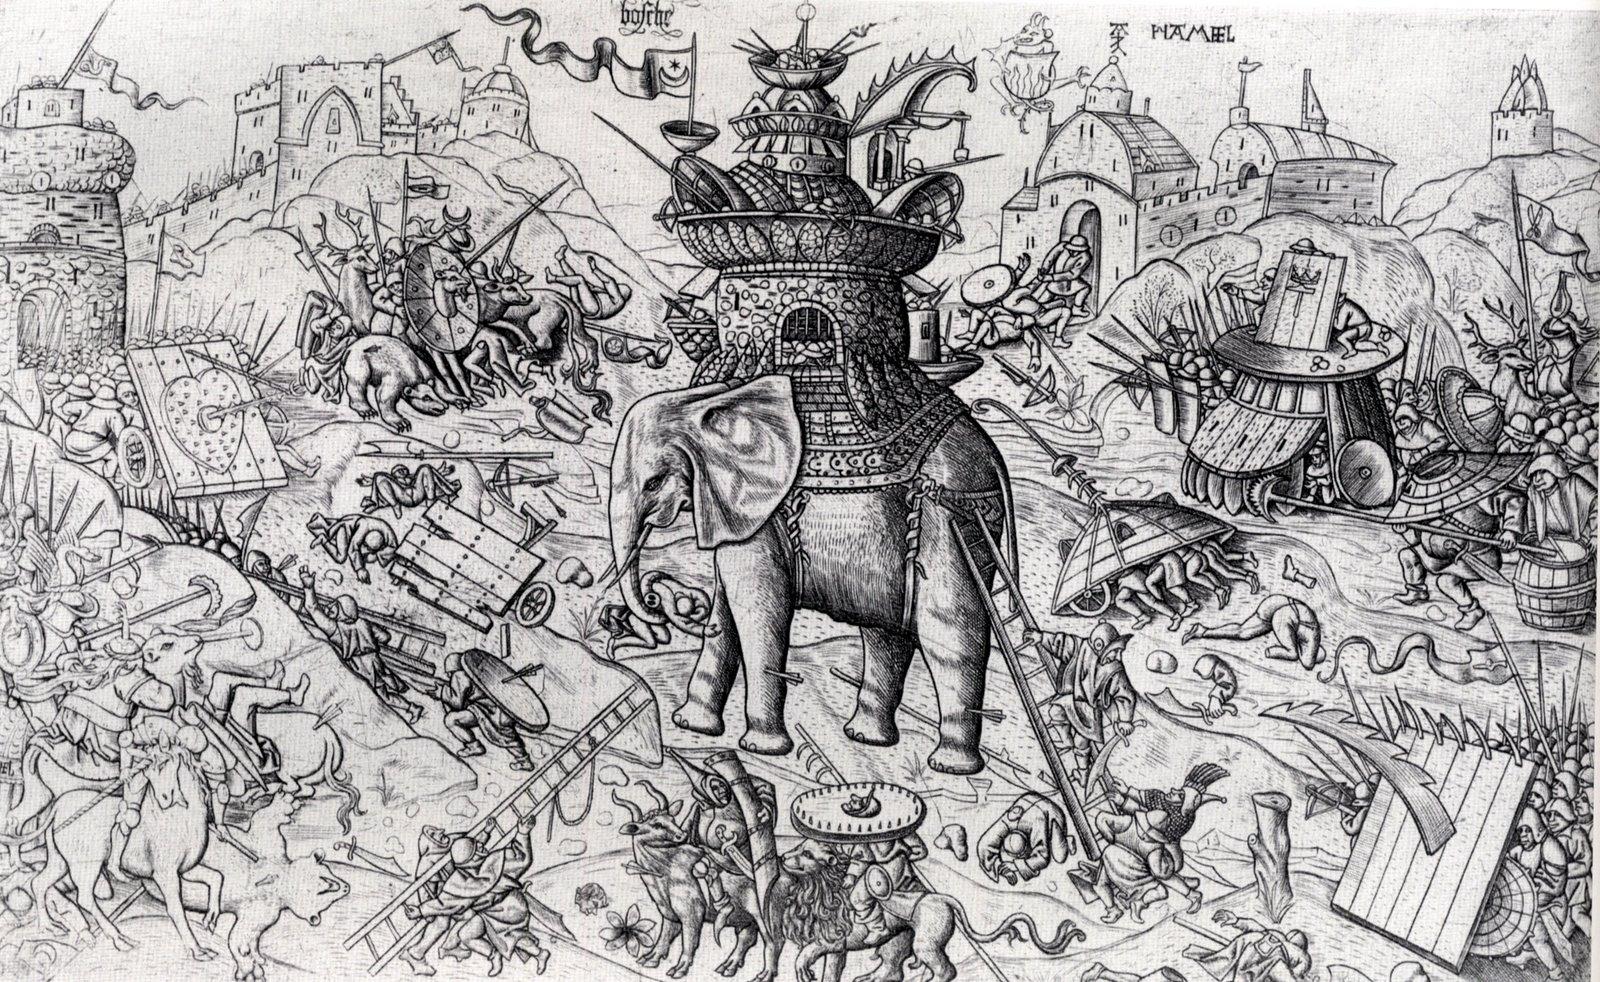 Alaert du Hamel, según original de El Bosco [Public domain], via Wikimedia Commons. https://commons.wikimedia.org/wiki/File%3AAlaert_du_Hamel_(after_Jheronimus_Bosch)_Elephant.jpg